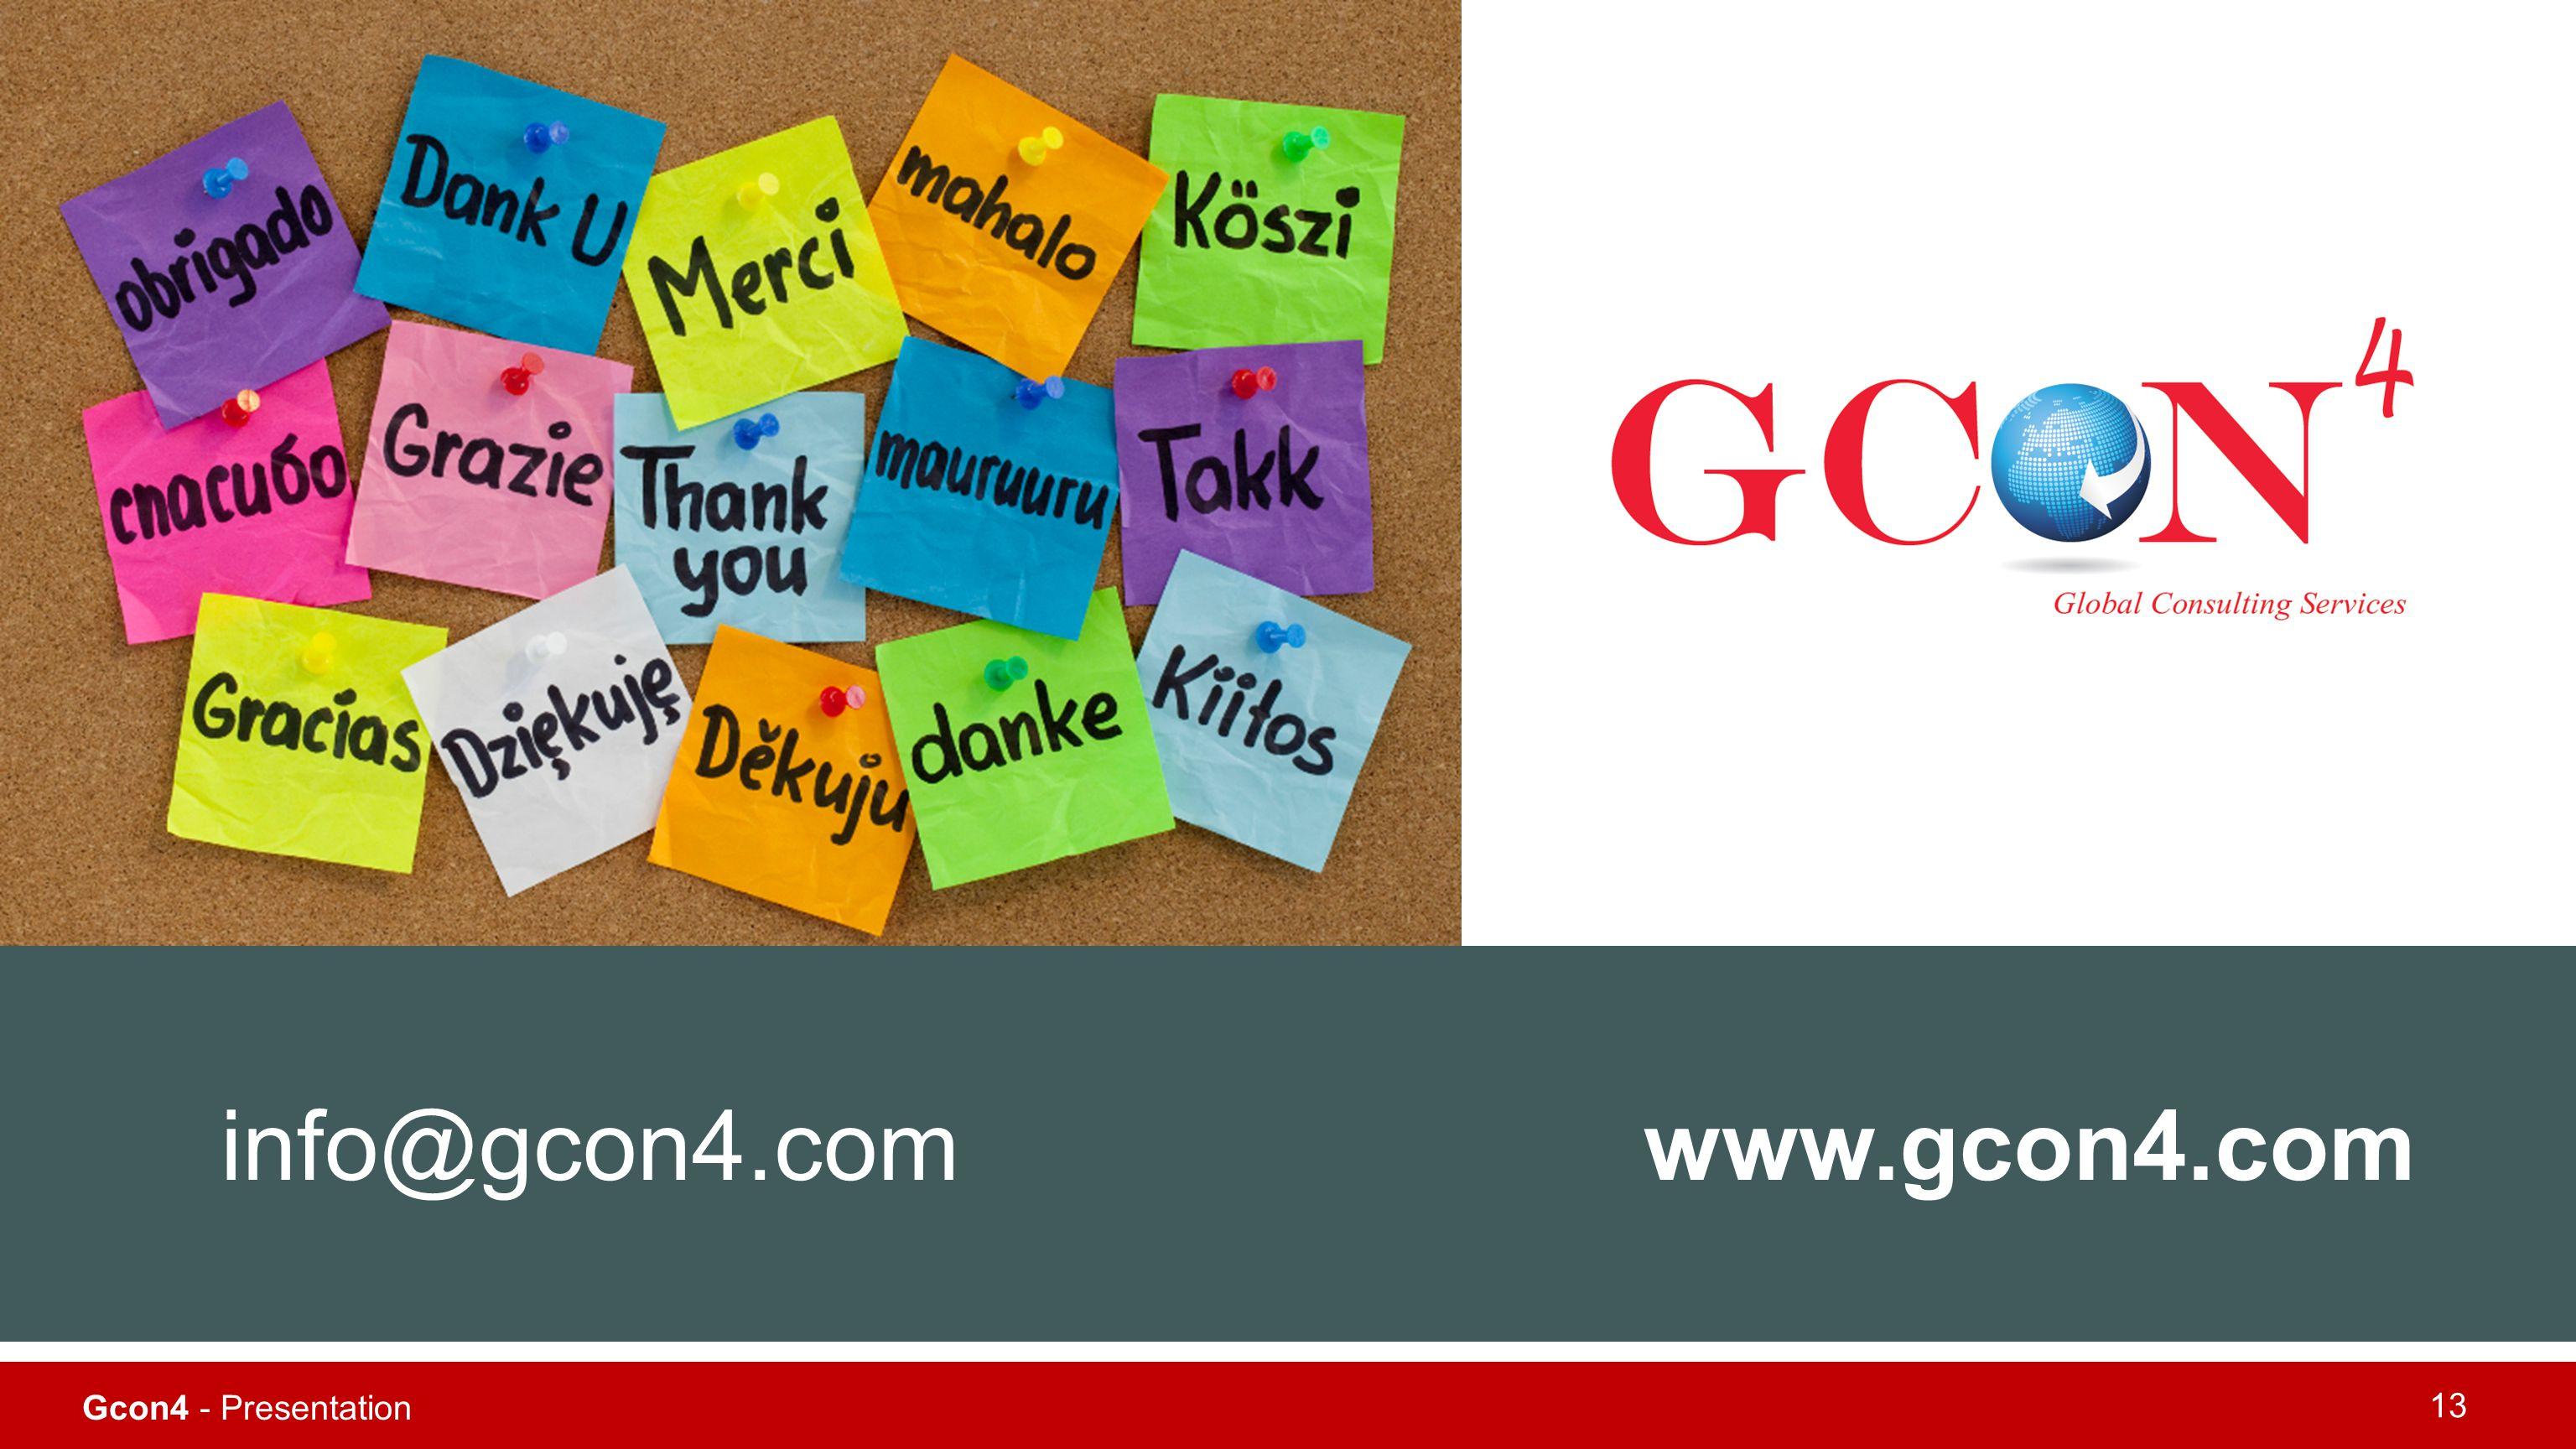 Gcon4 - Presentation 13 www.gcon4.cominfo@gcon4.com